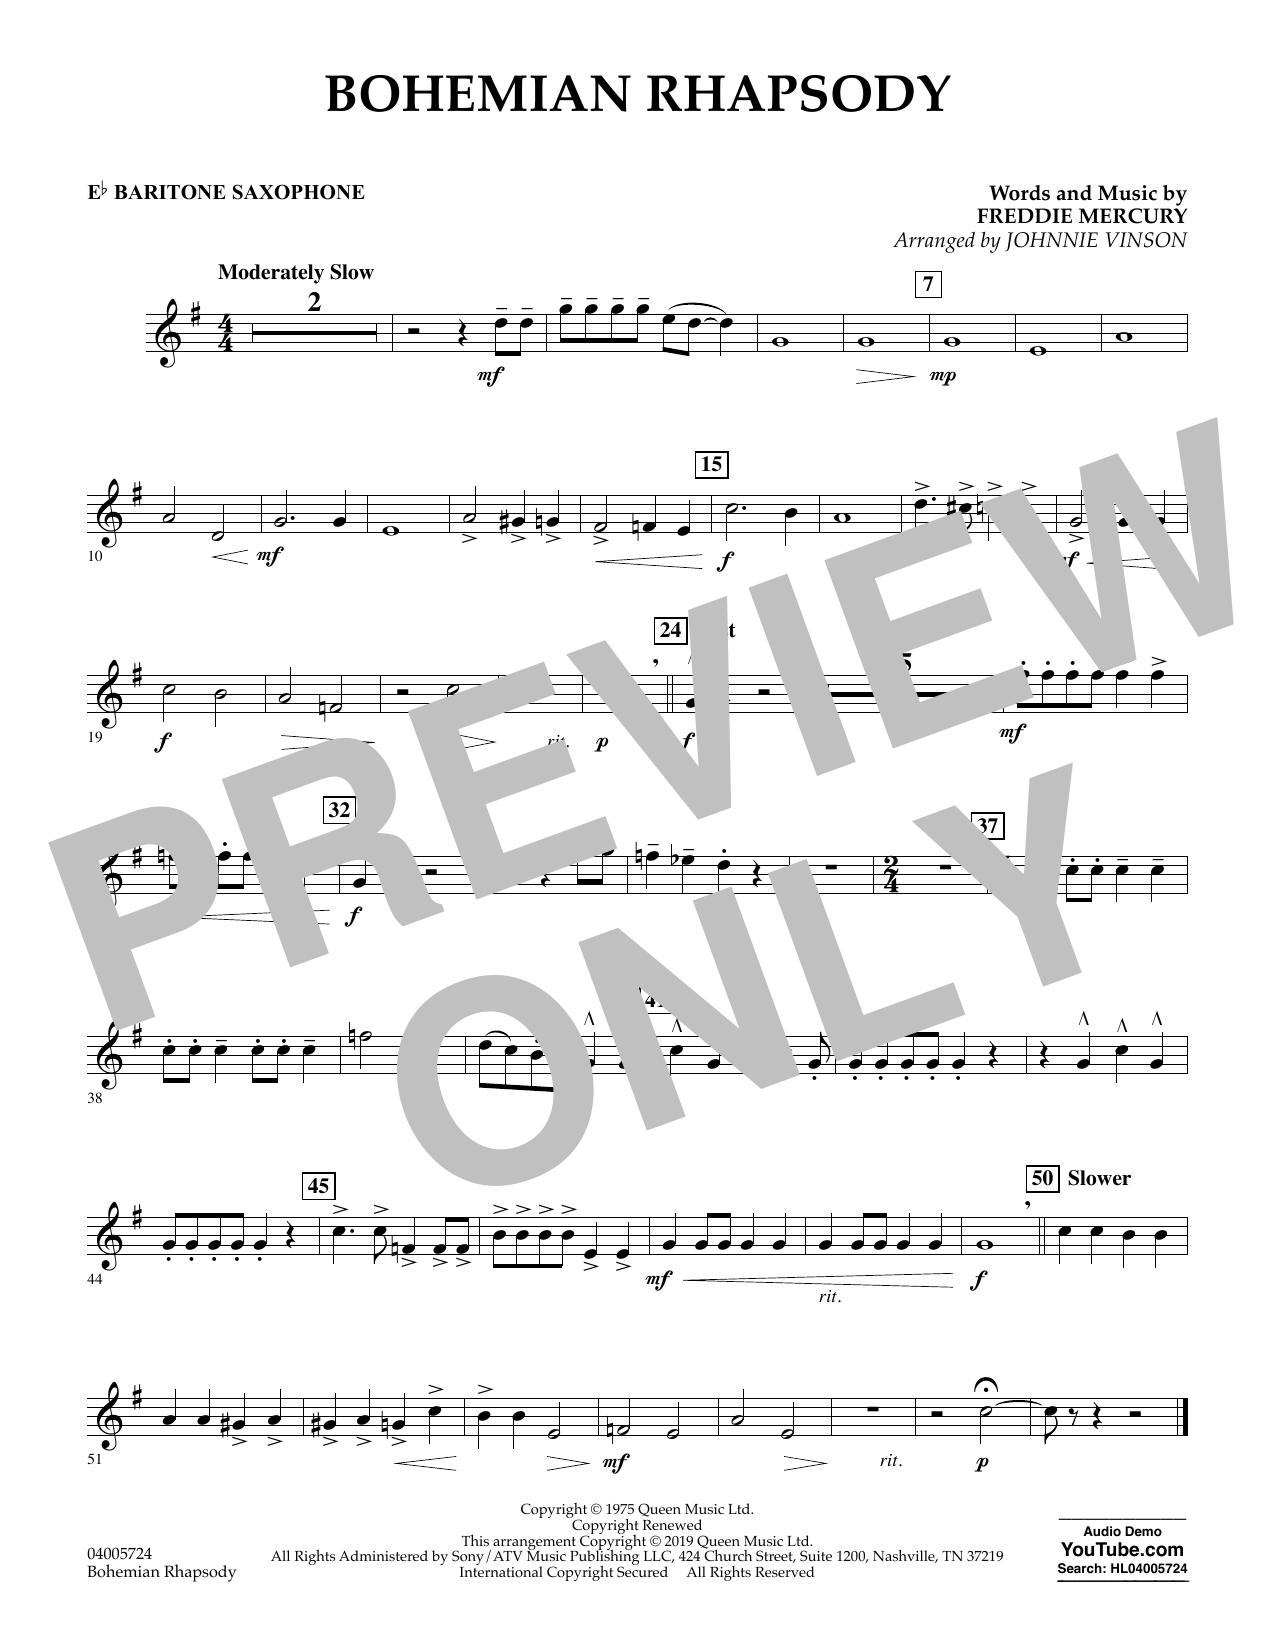 Bohemian Rhapsody (arr. Johnnie Vinson) - Eb Baritone Saxophone (Concert Band)